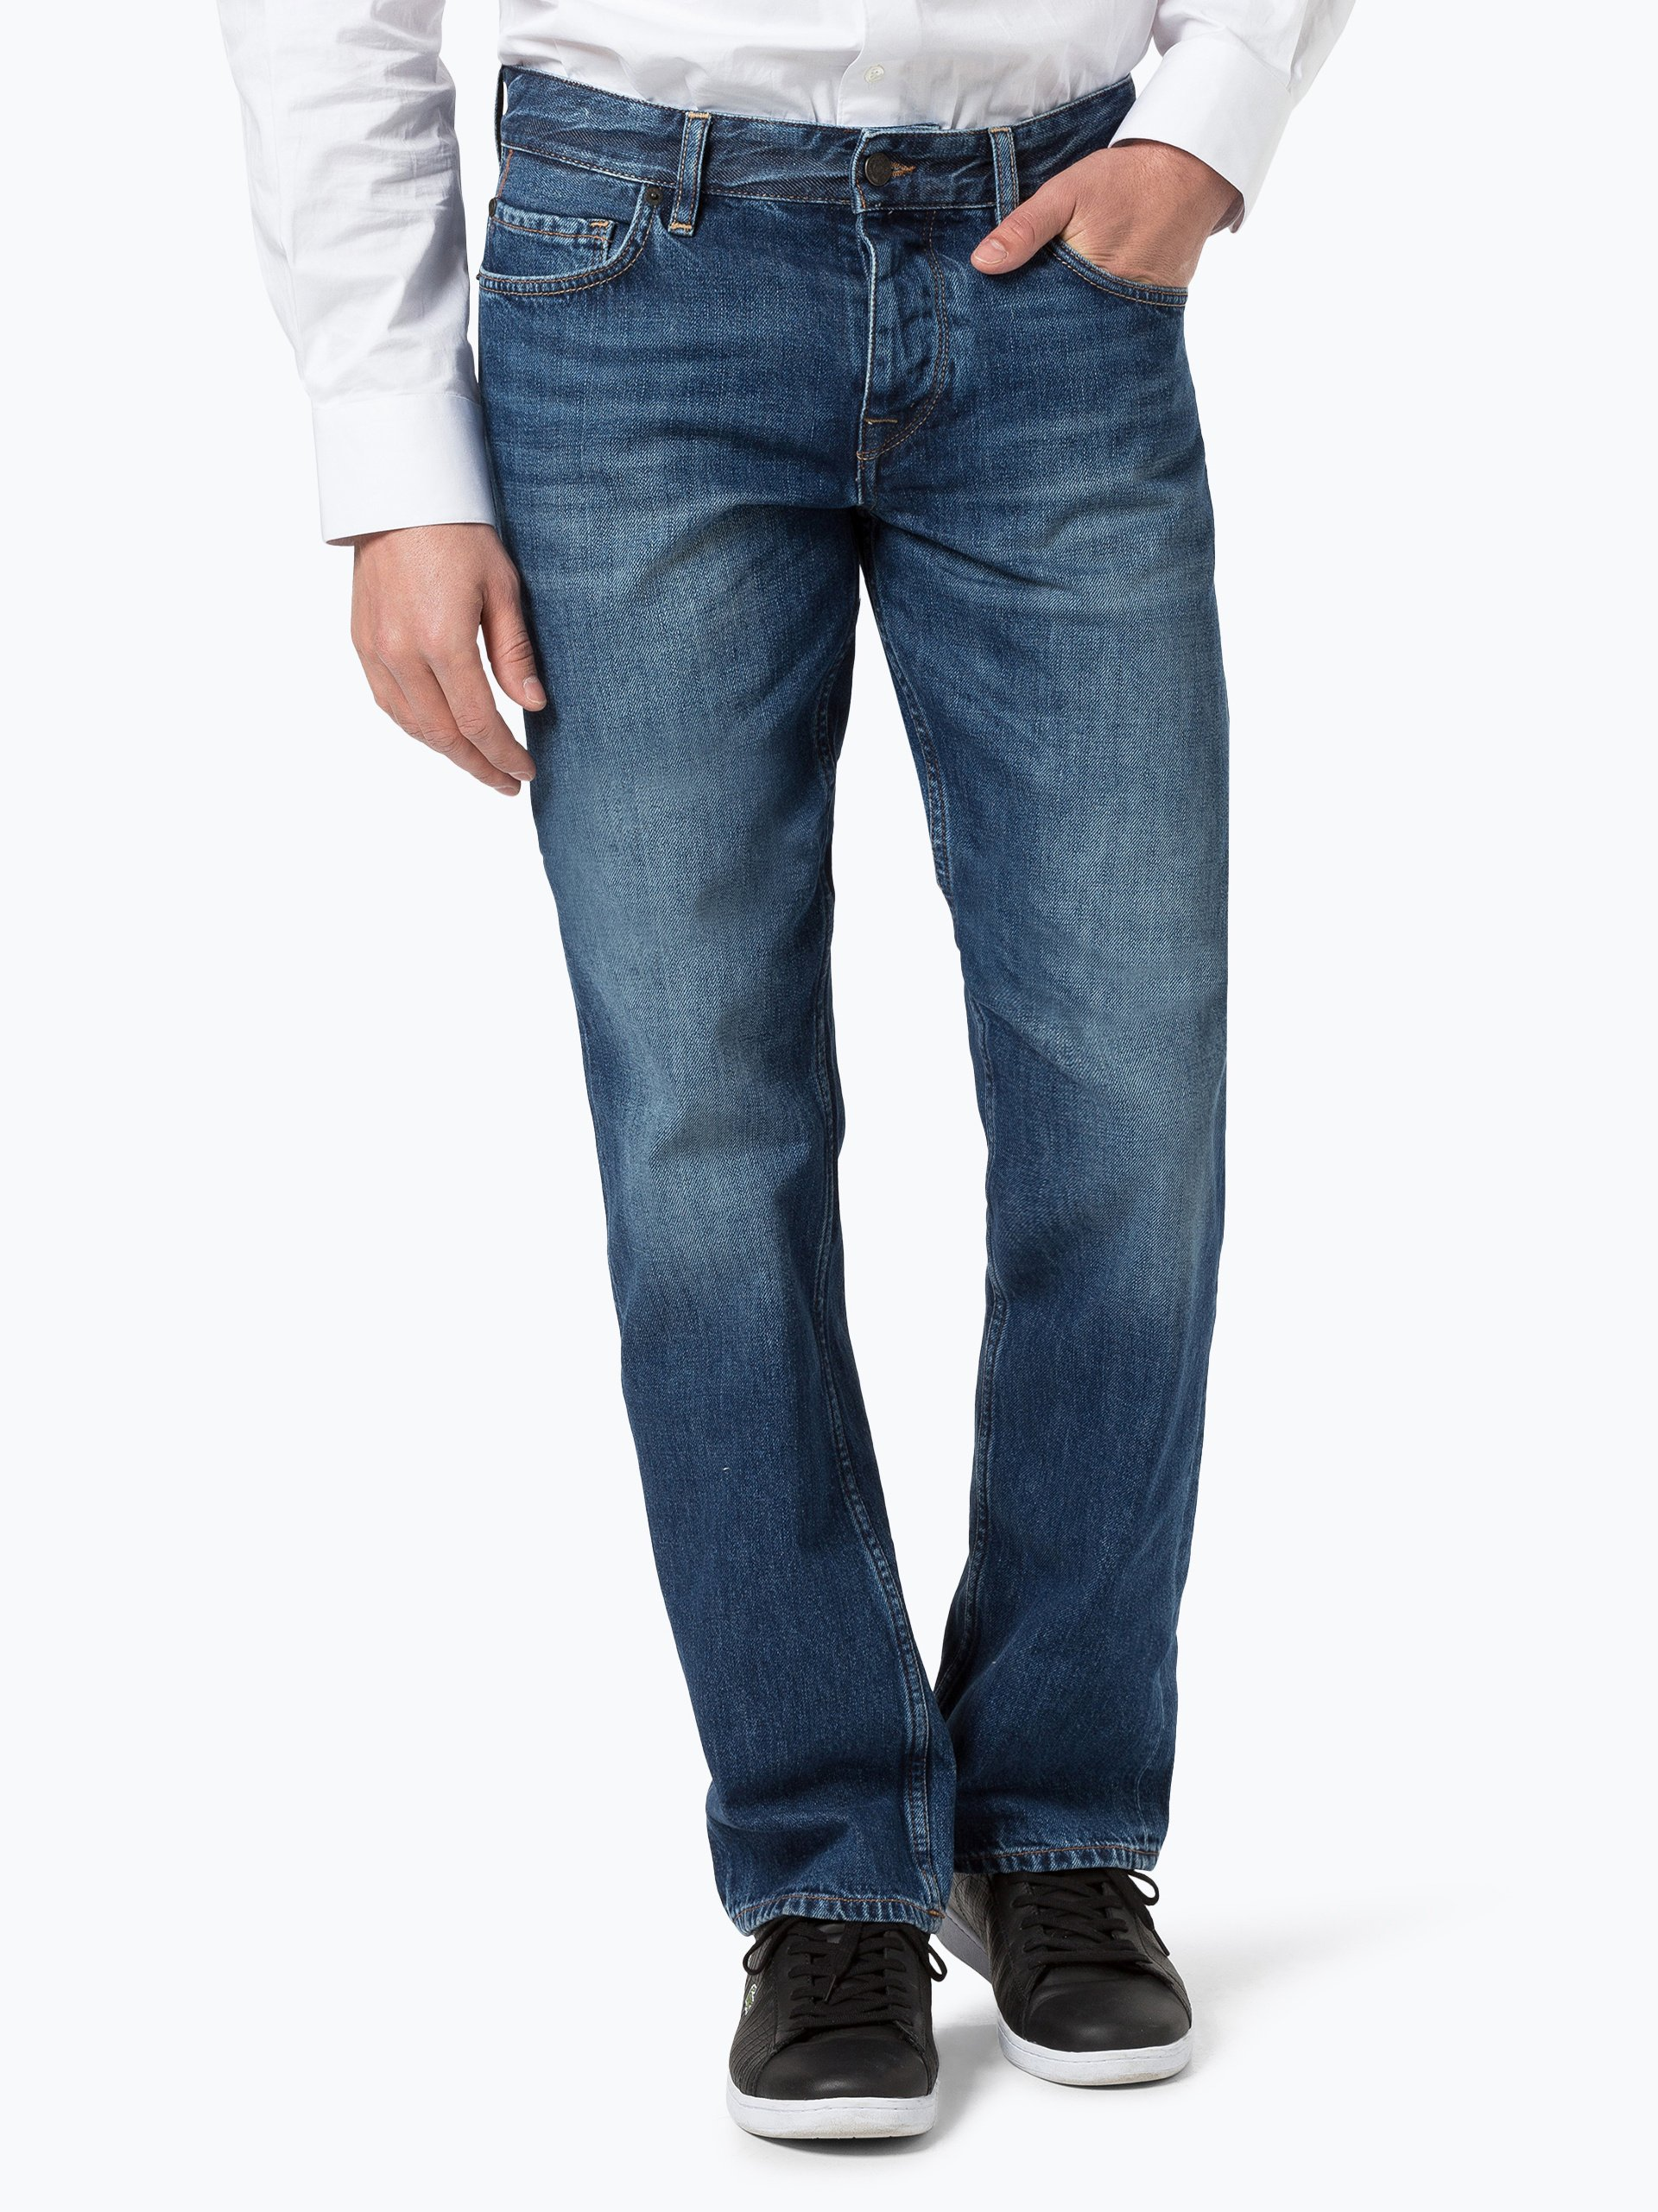 boss casual herren jeans orange 25 online kaufen vangraaf com. Black Bedroom Furniture Sets. Home Design Ideas